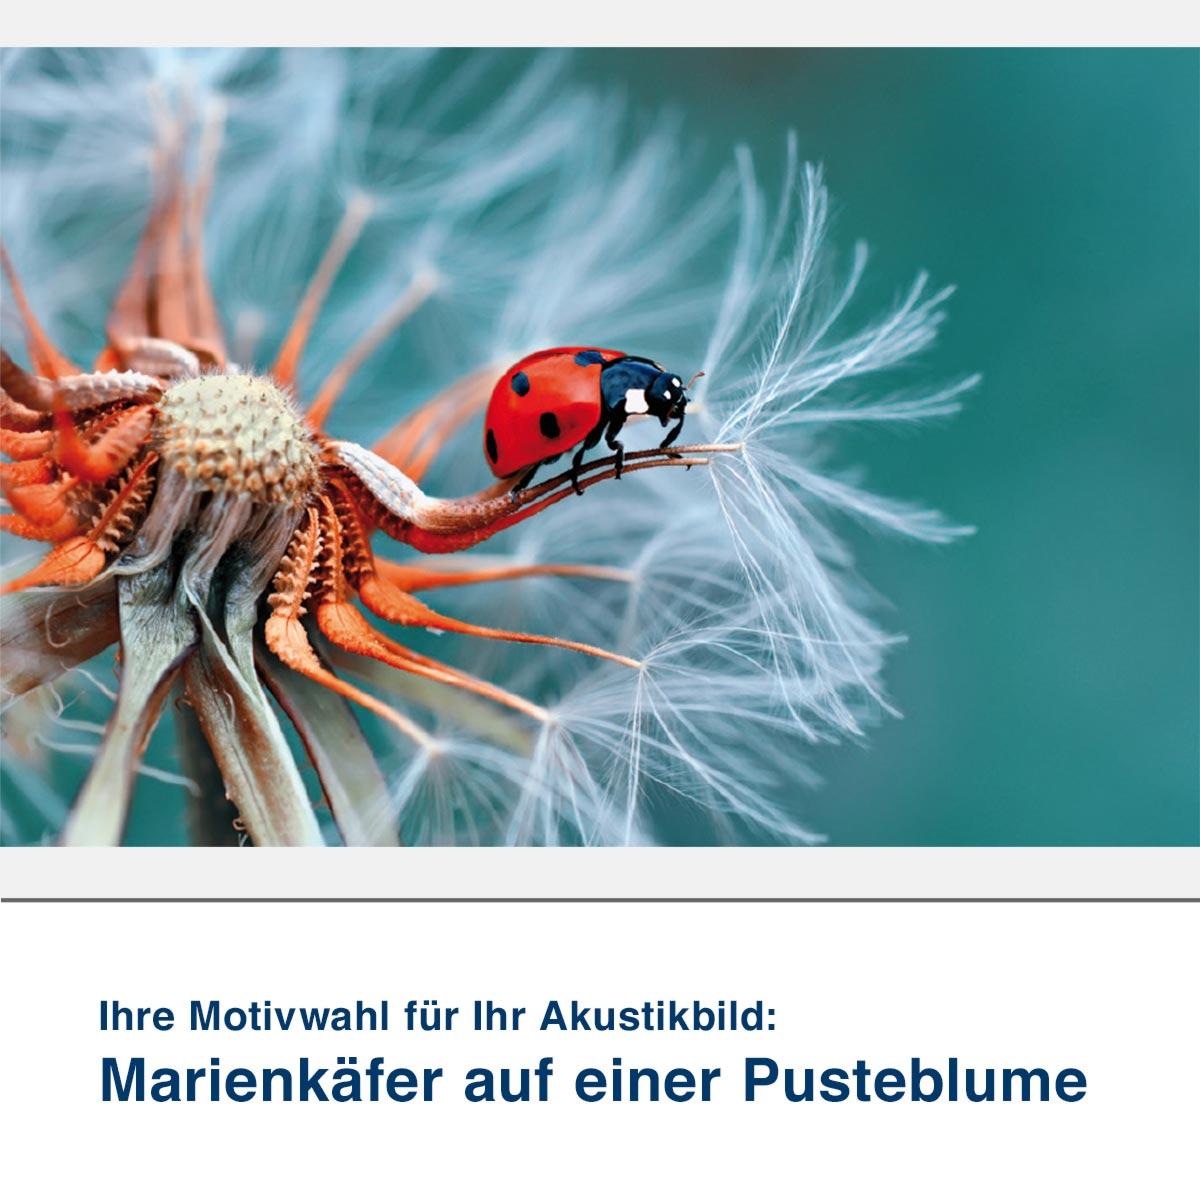 Akustikbild Motiv Marienkäfer auf einer Pusteblume